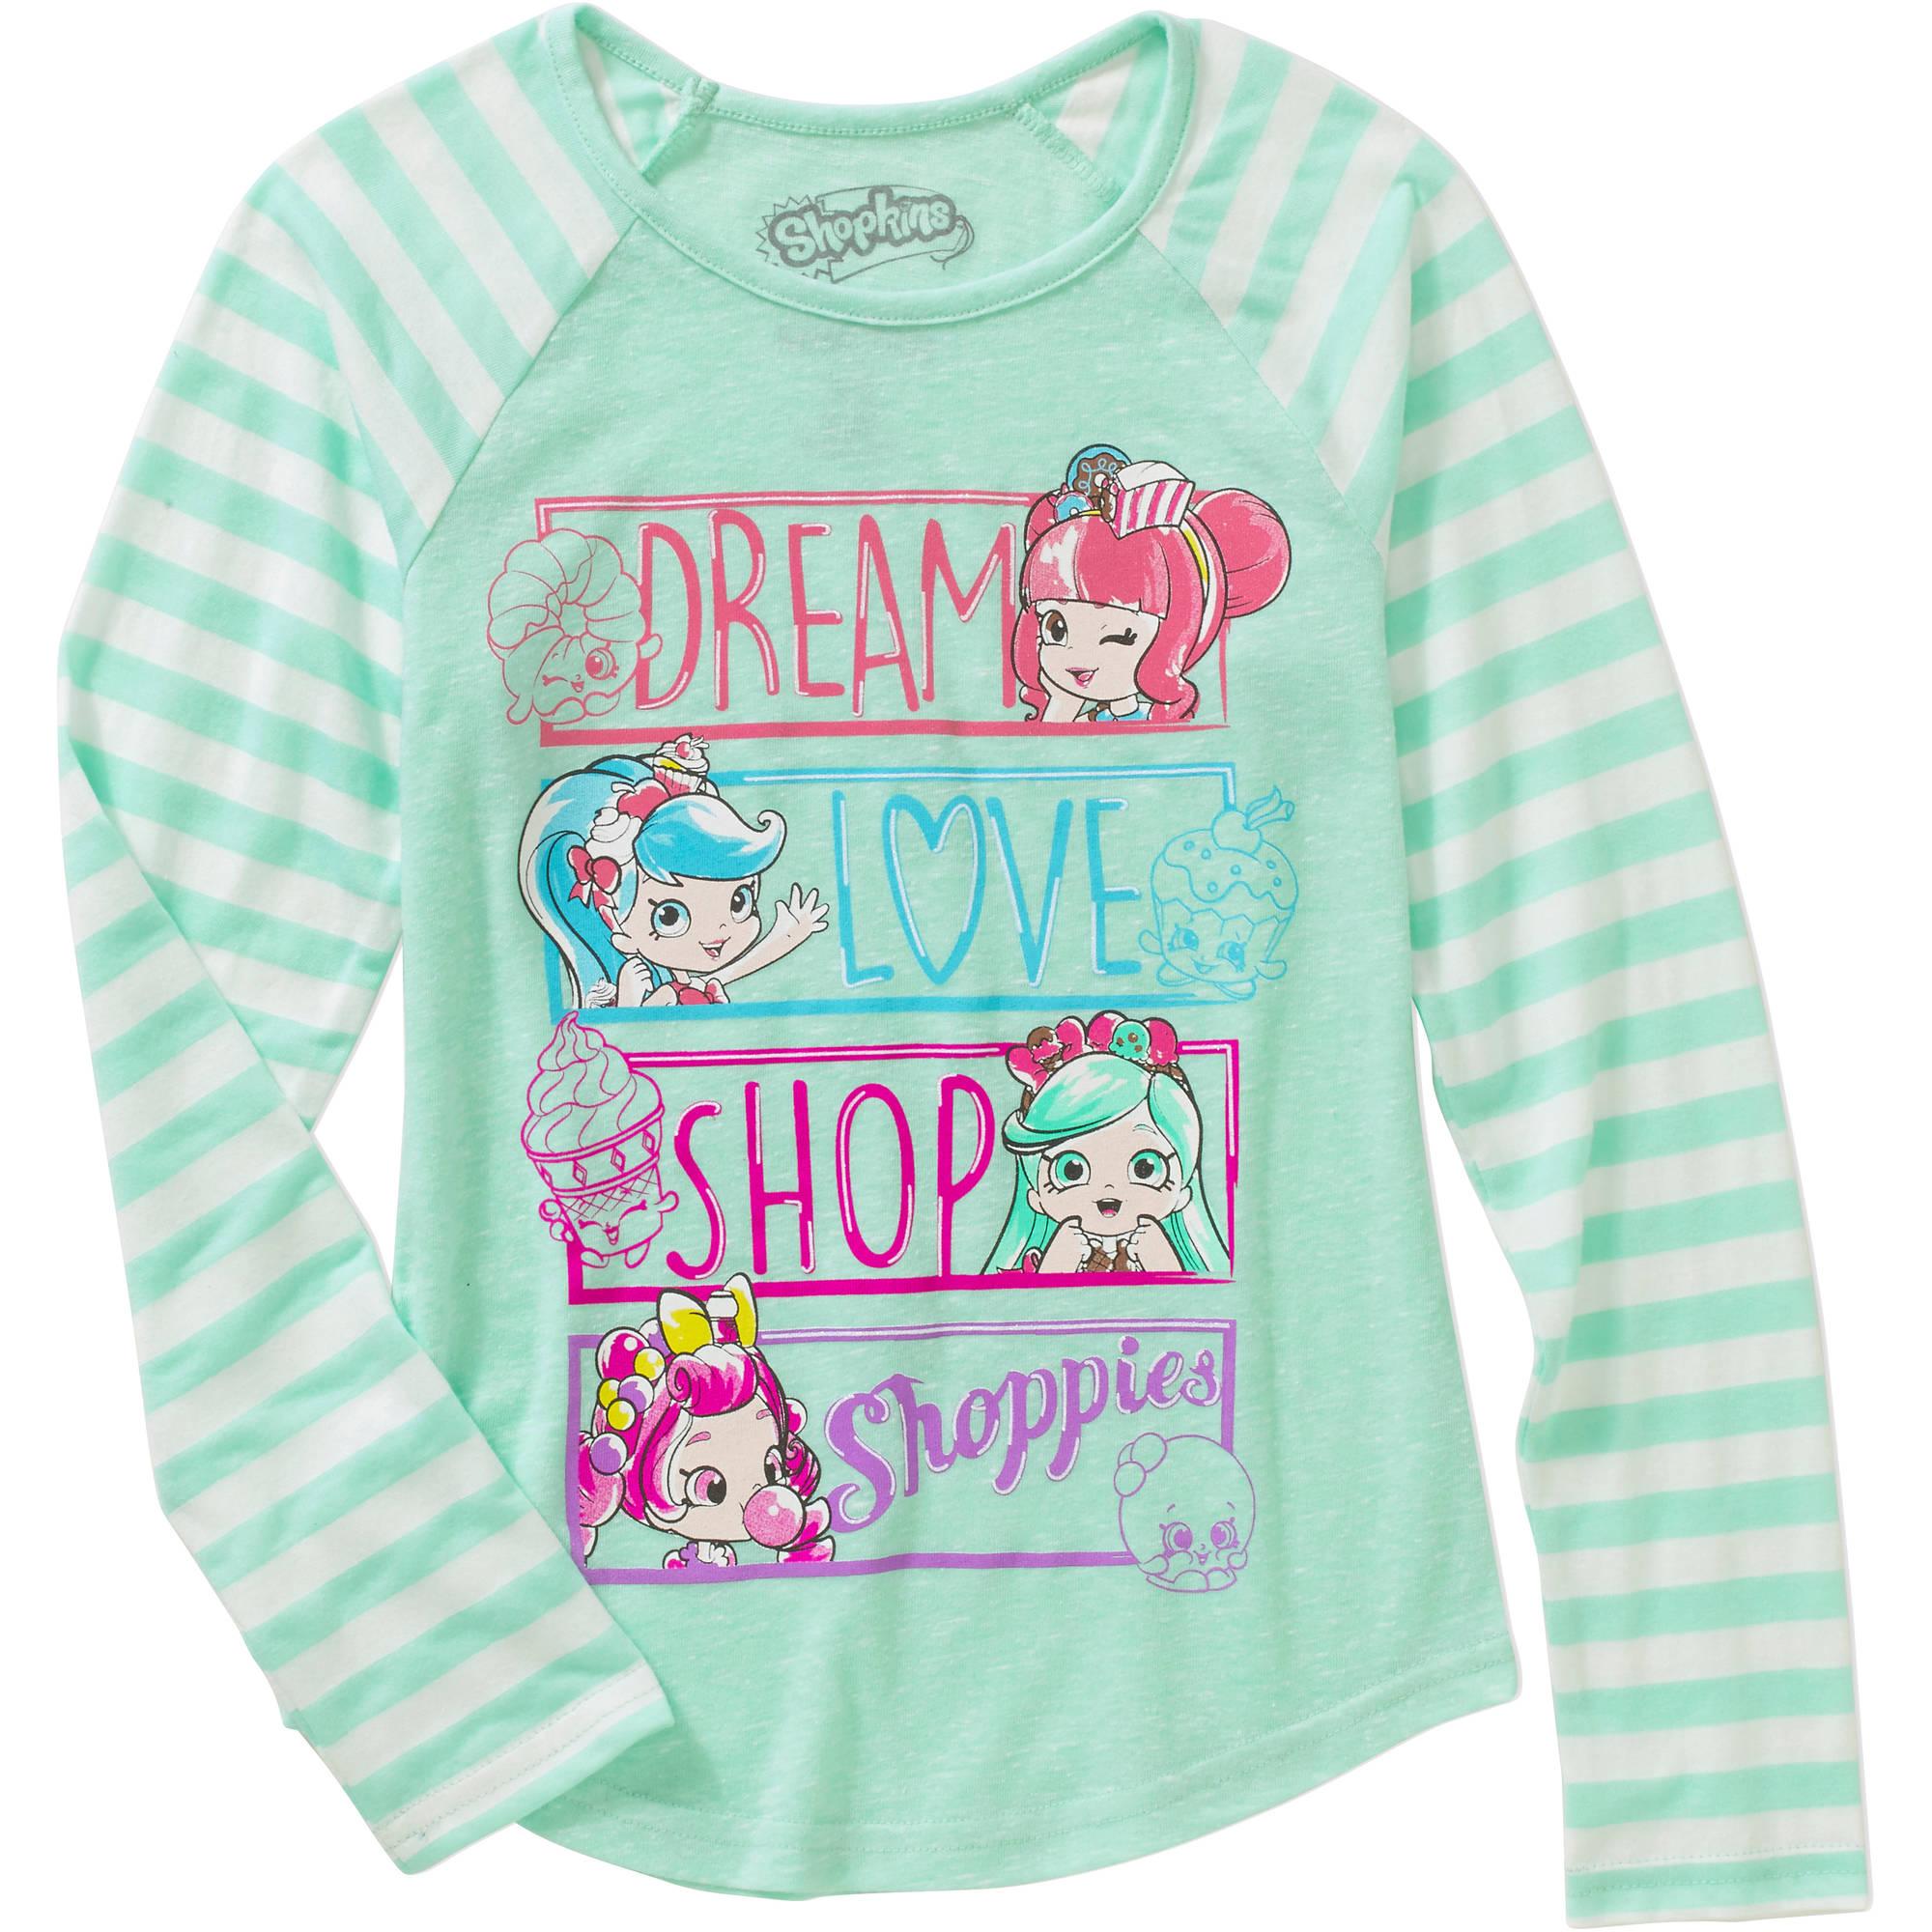 Girls\' Shoppies Dream Love Shop Graphic Tee - Walmart.com